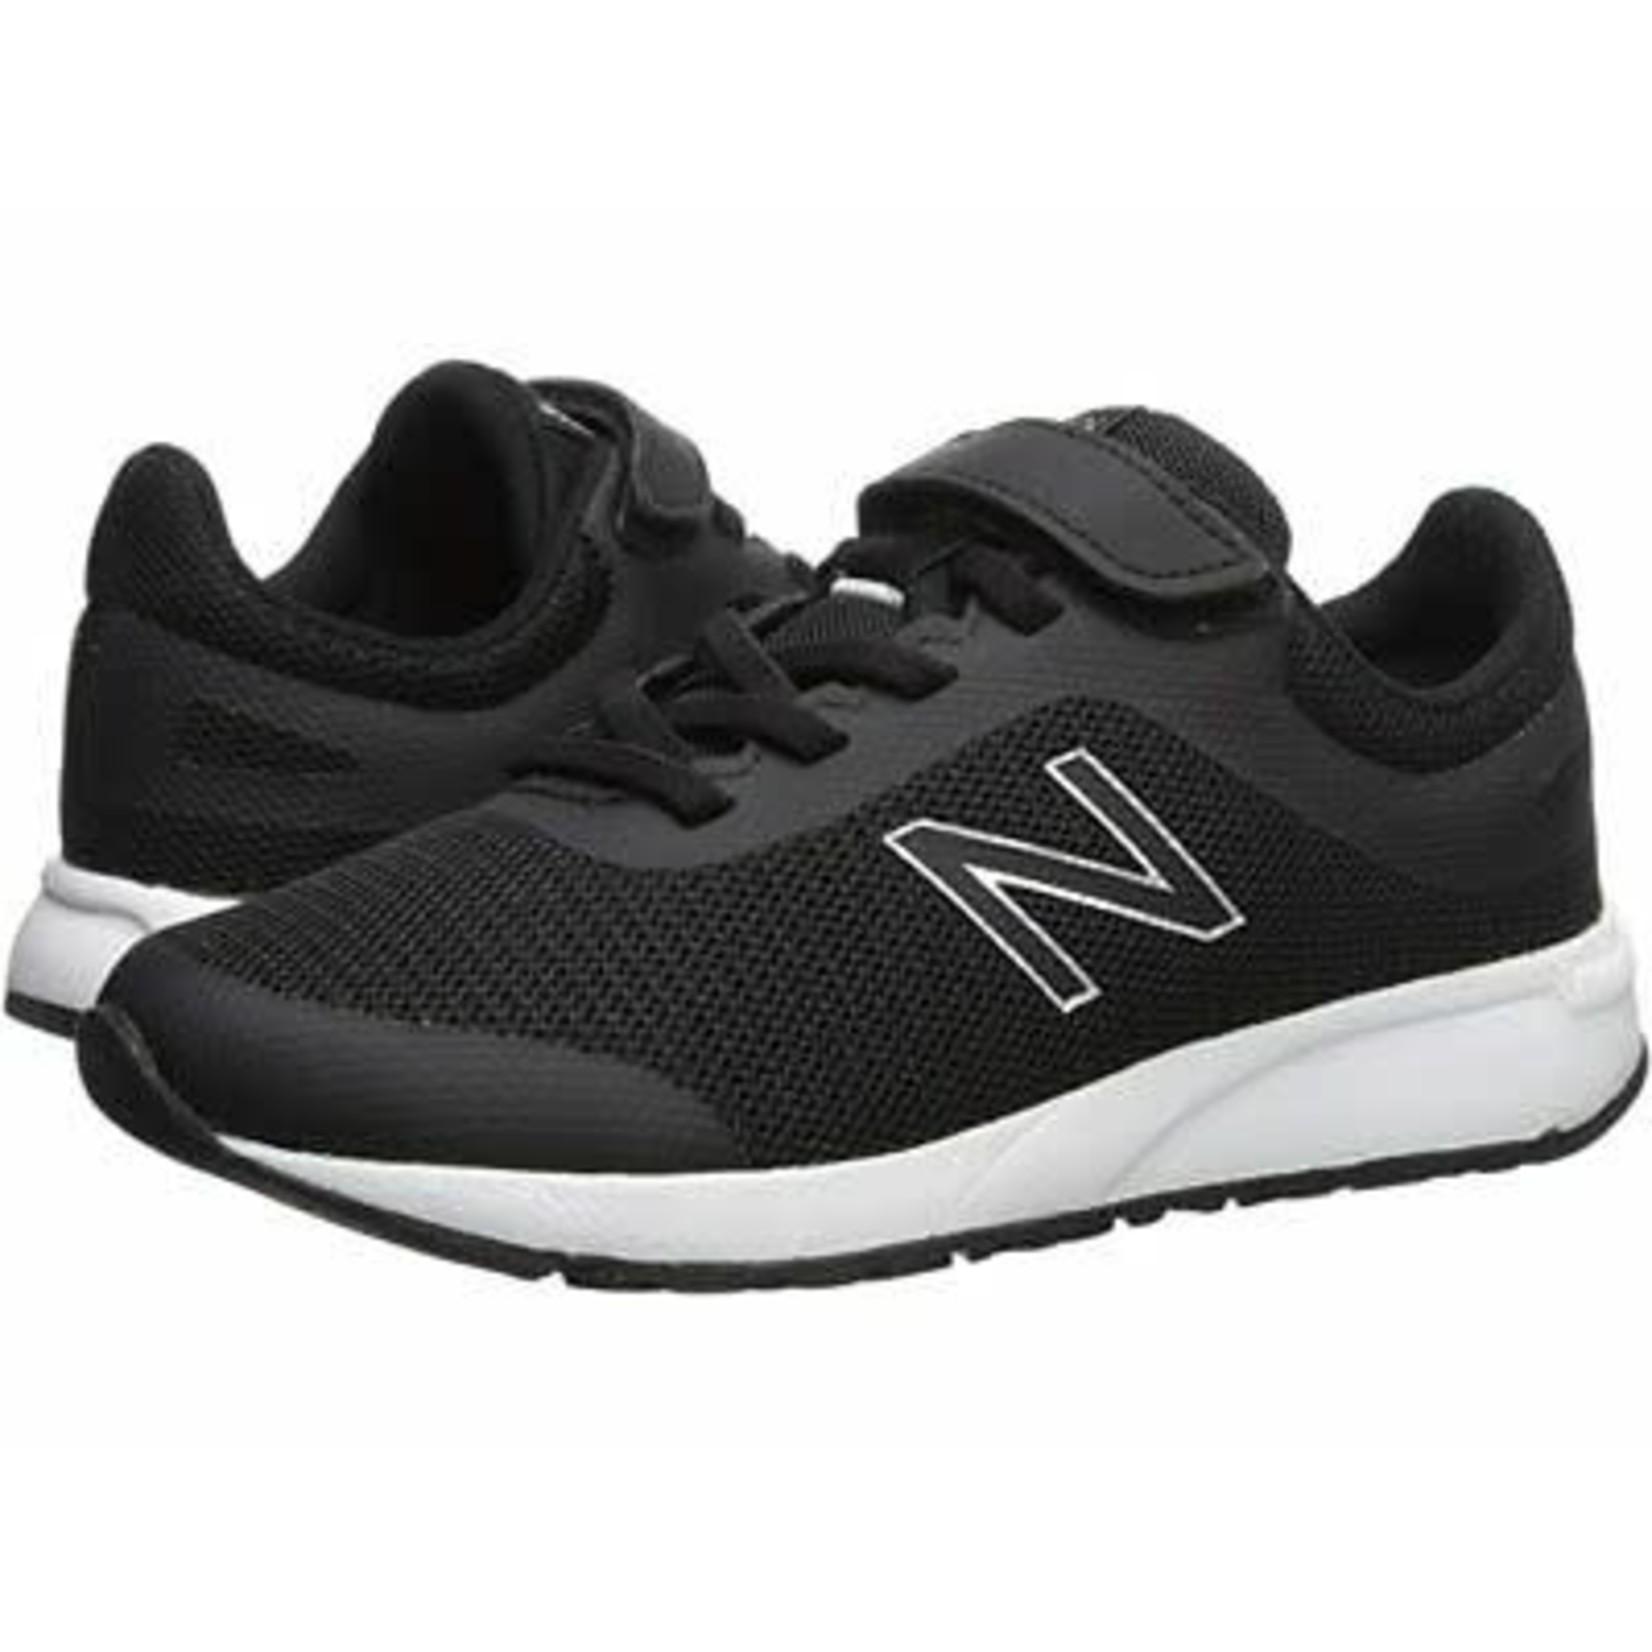 New Balance New Balance Running Shoes, YT455BG, BPS, Boys